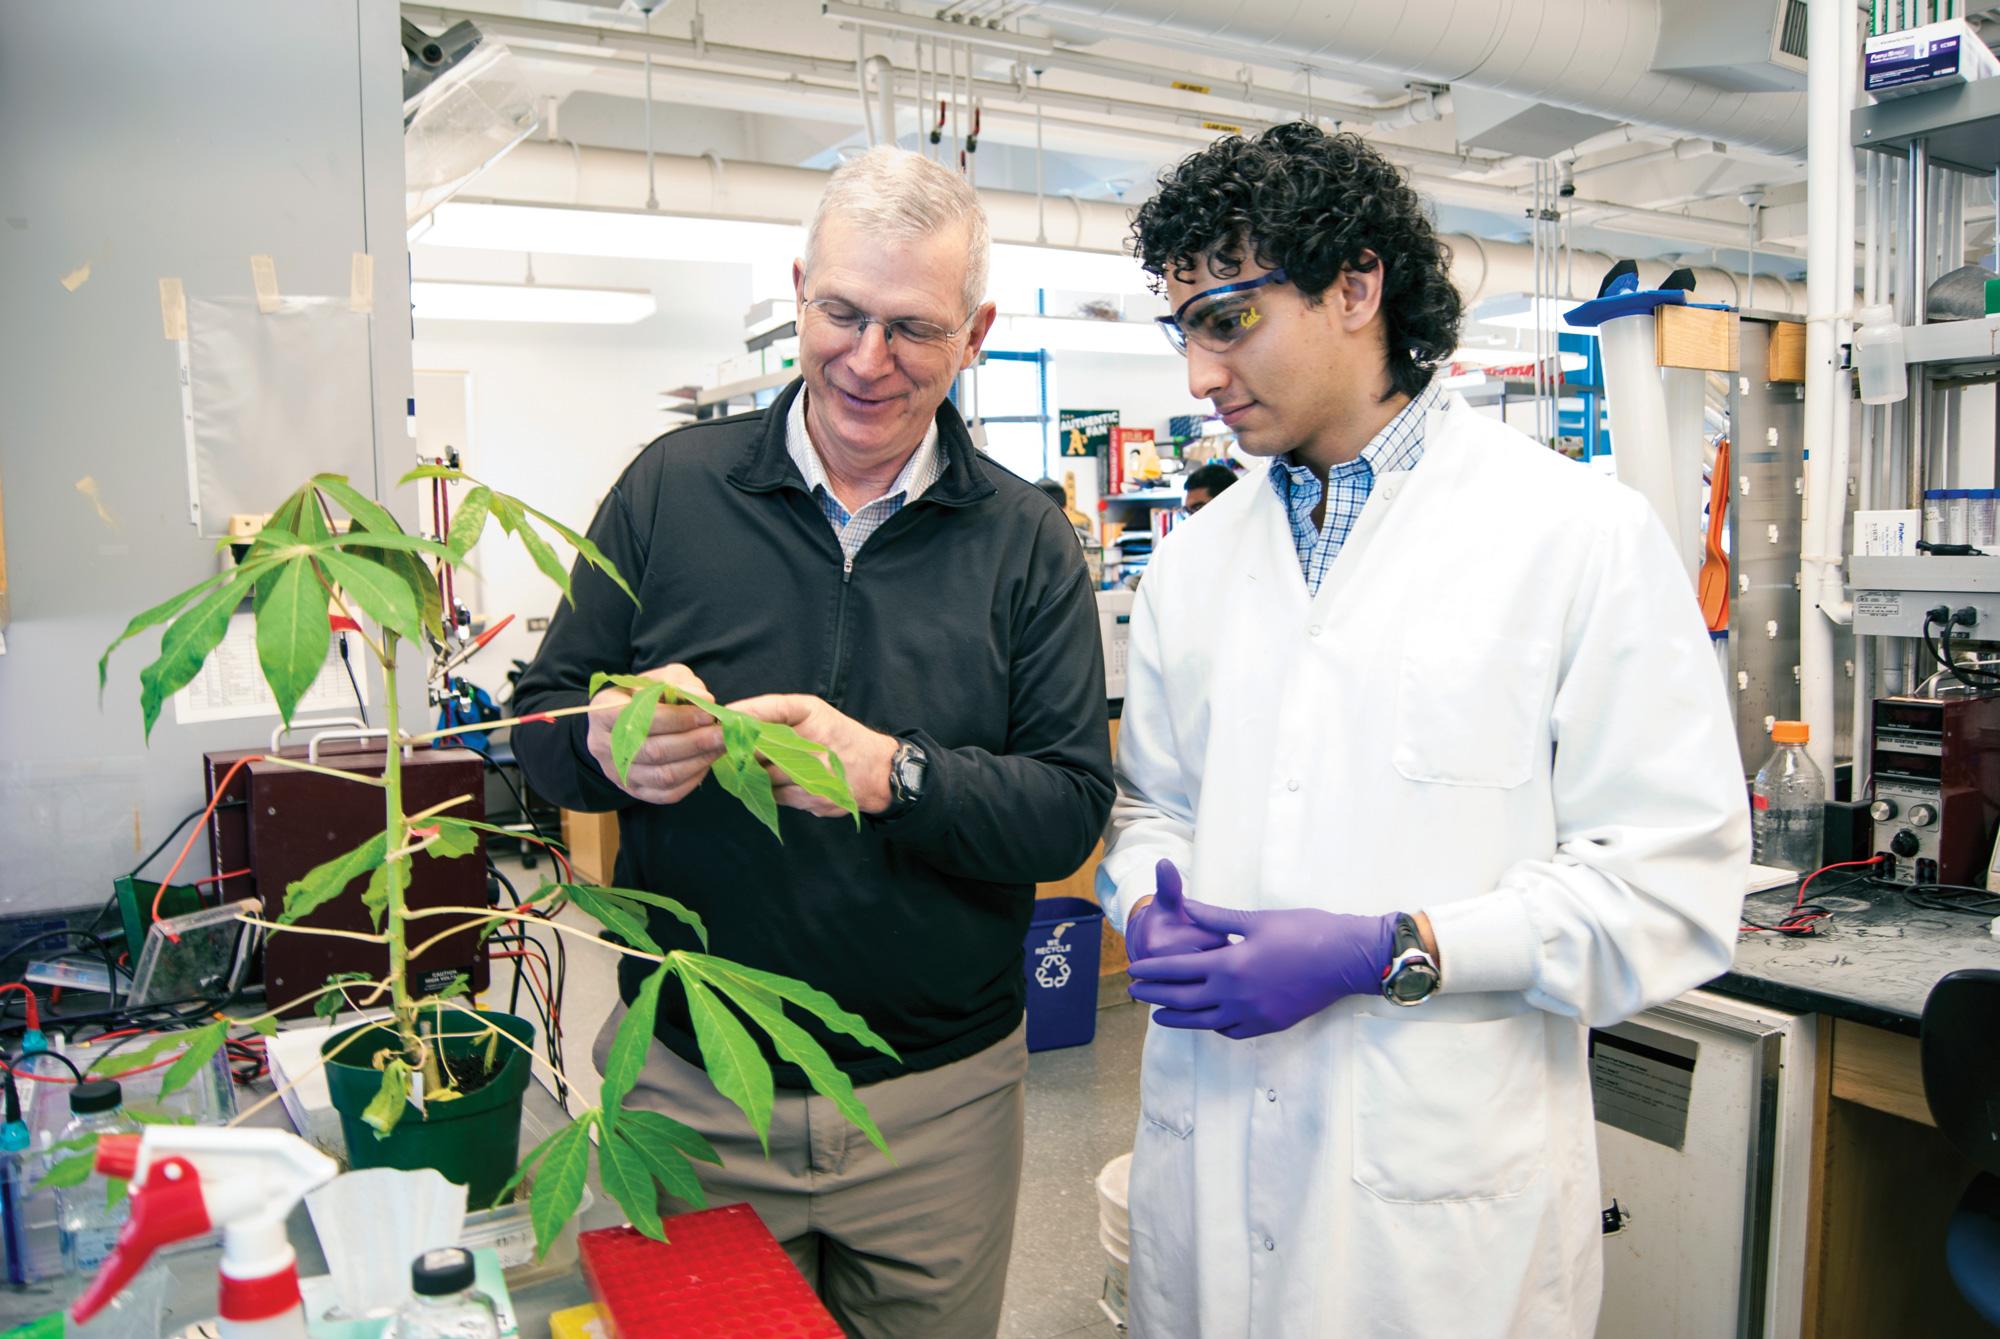 Professor Brian Staskawicz and Michael Gomez examine a cassava plant. Gomez is working to engineer disease resistance into cassava using CRISPR/Cas9 gene editing. credit: David Galvez/PMB